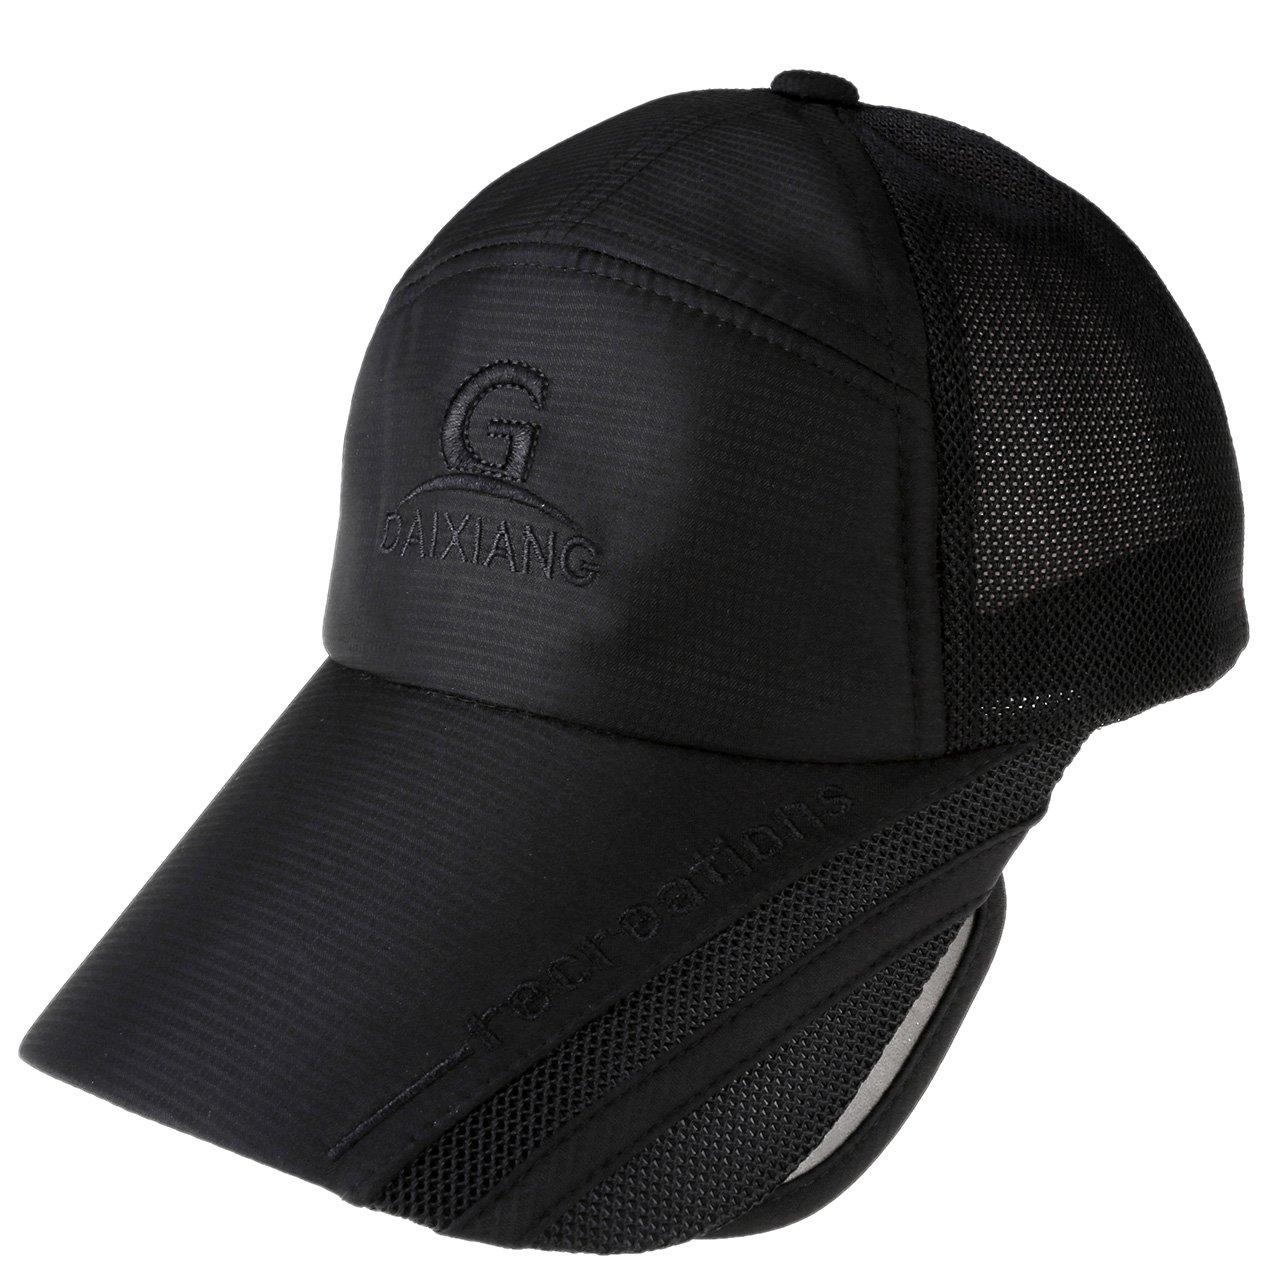 3bfdce36 Ayliss Men Women Curved Visor Hats Sunscreen Scalable Brim UV Proof  Baseball Cap